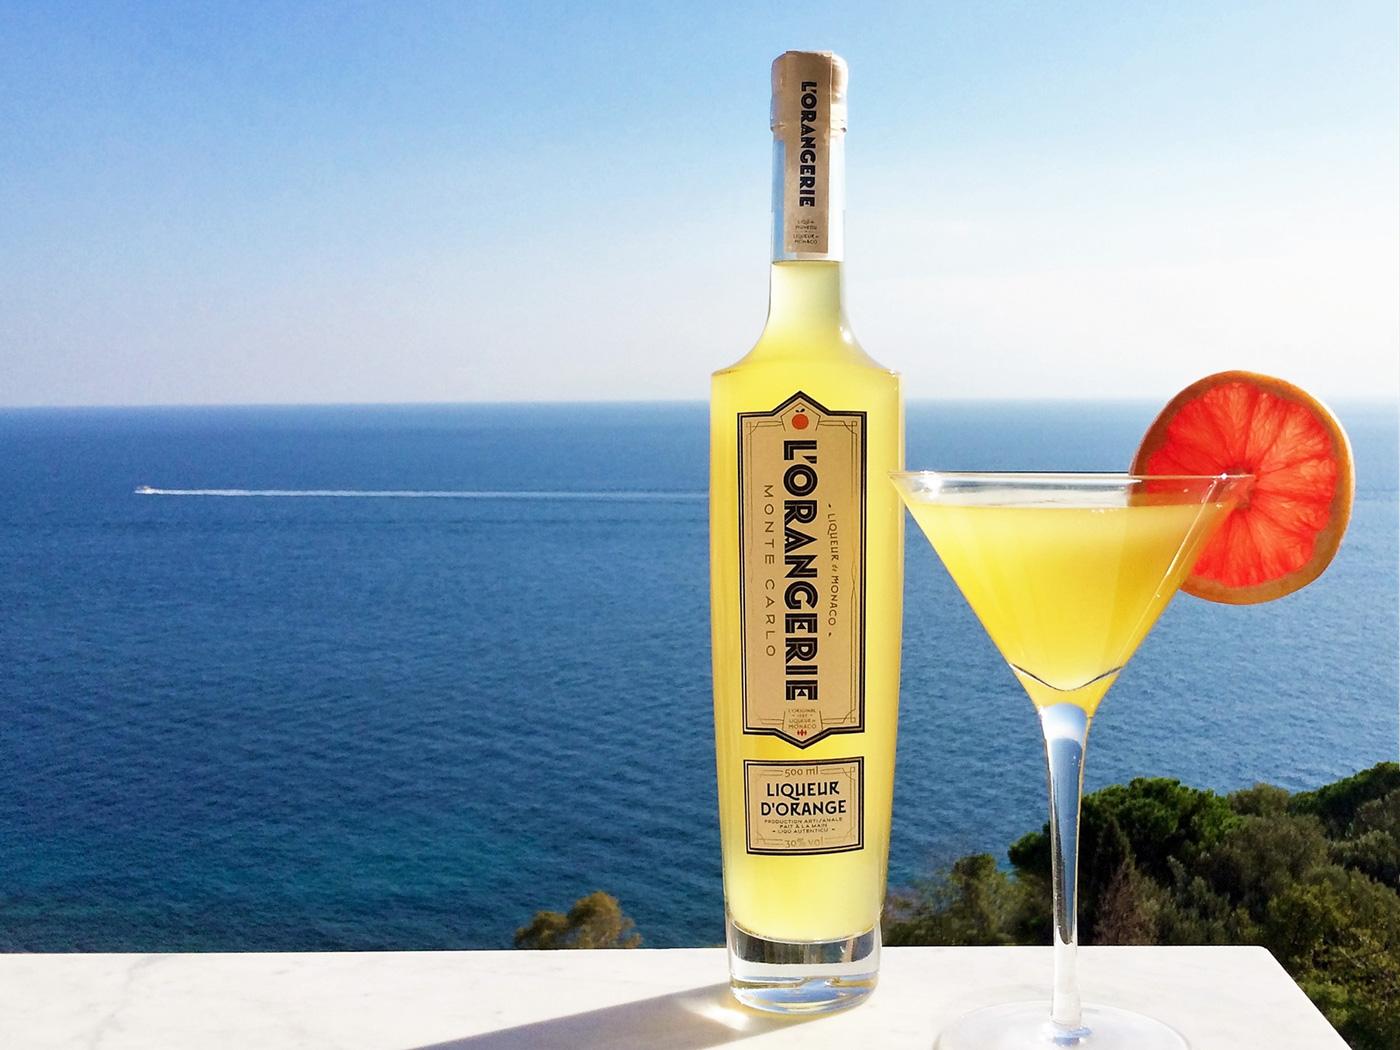 L'Orangerie Monte Carlo Orange Liqueur Lifestyle 3